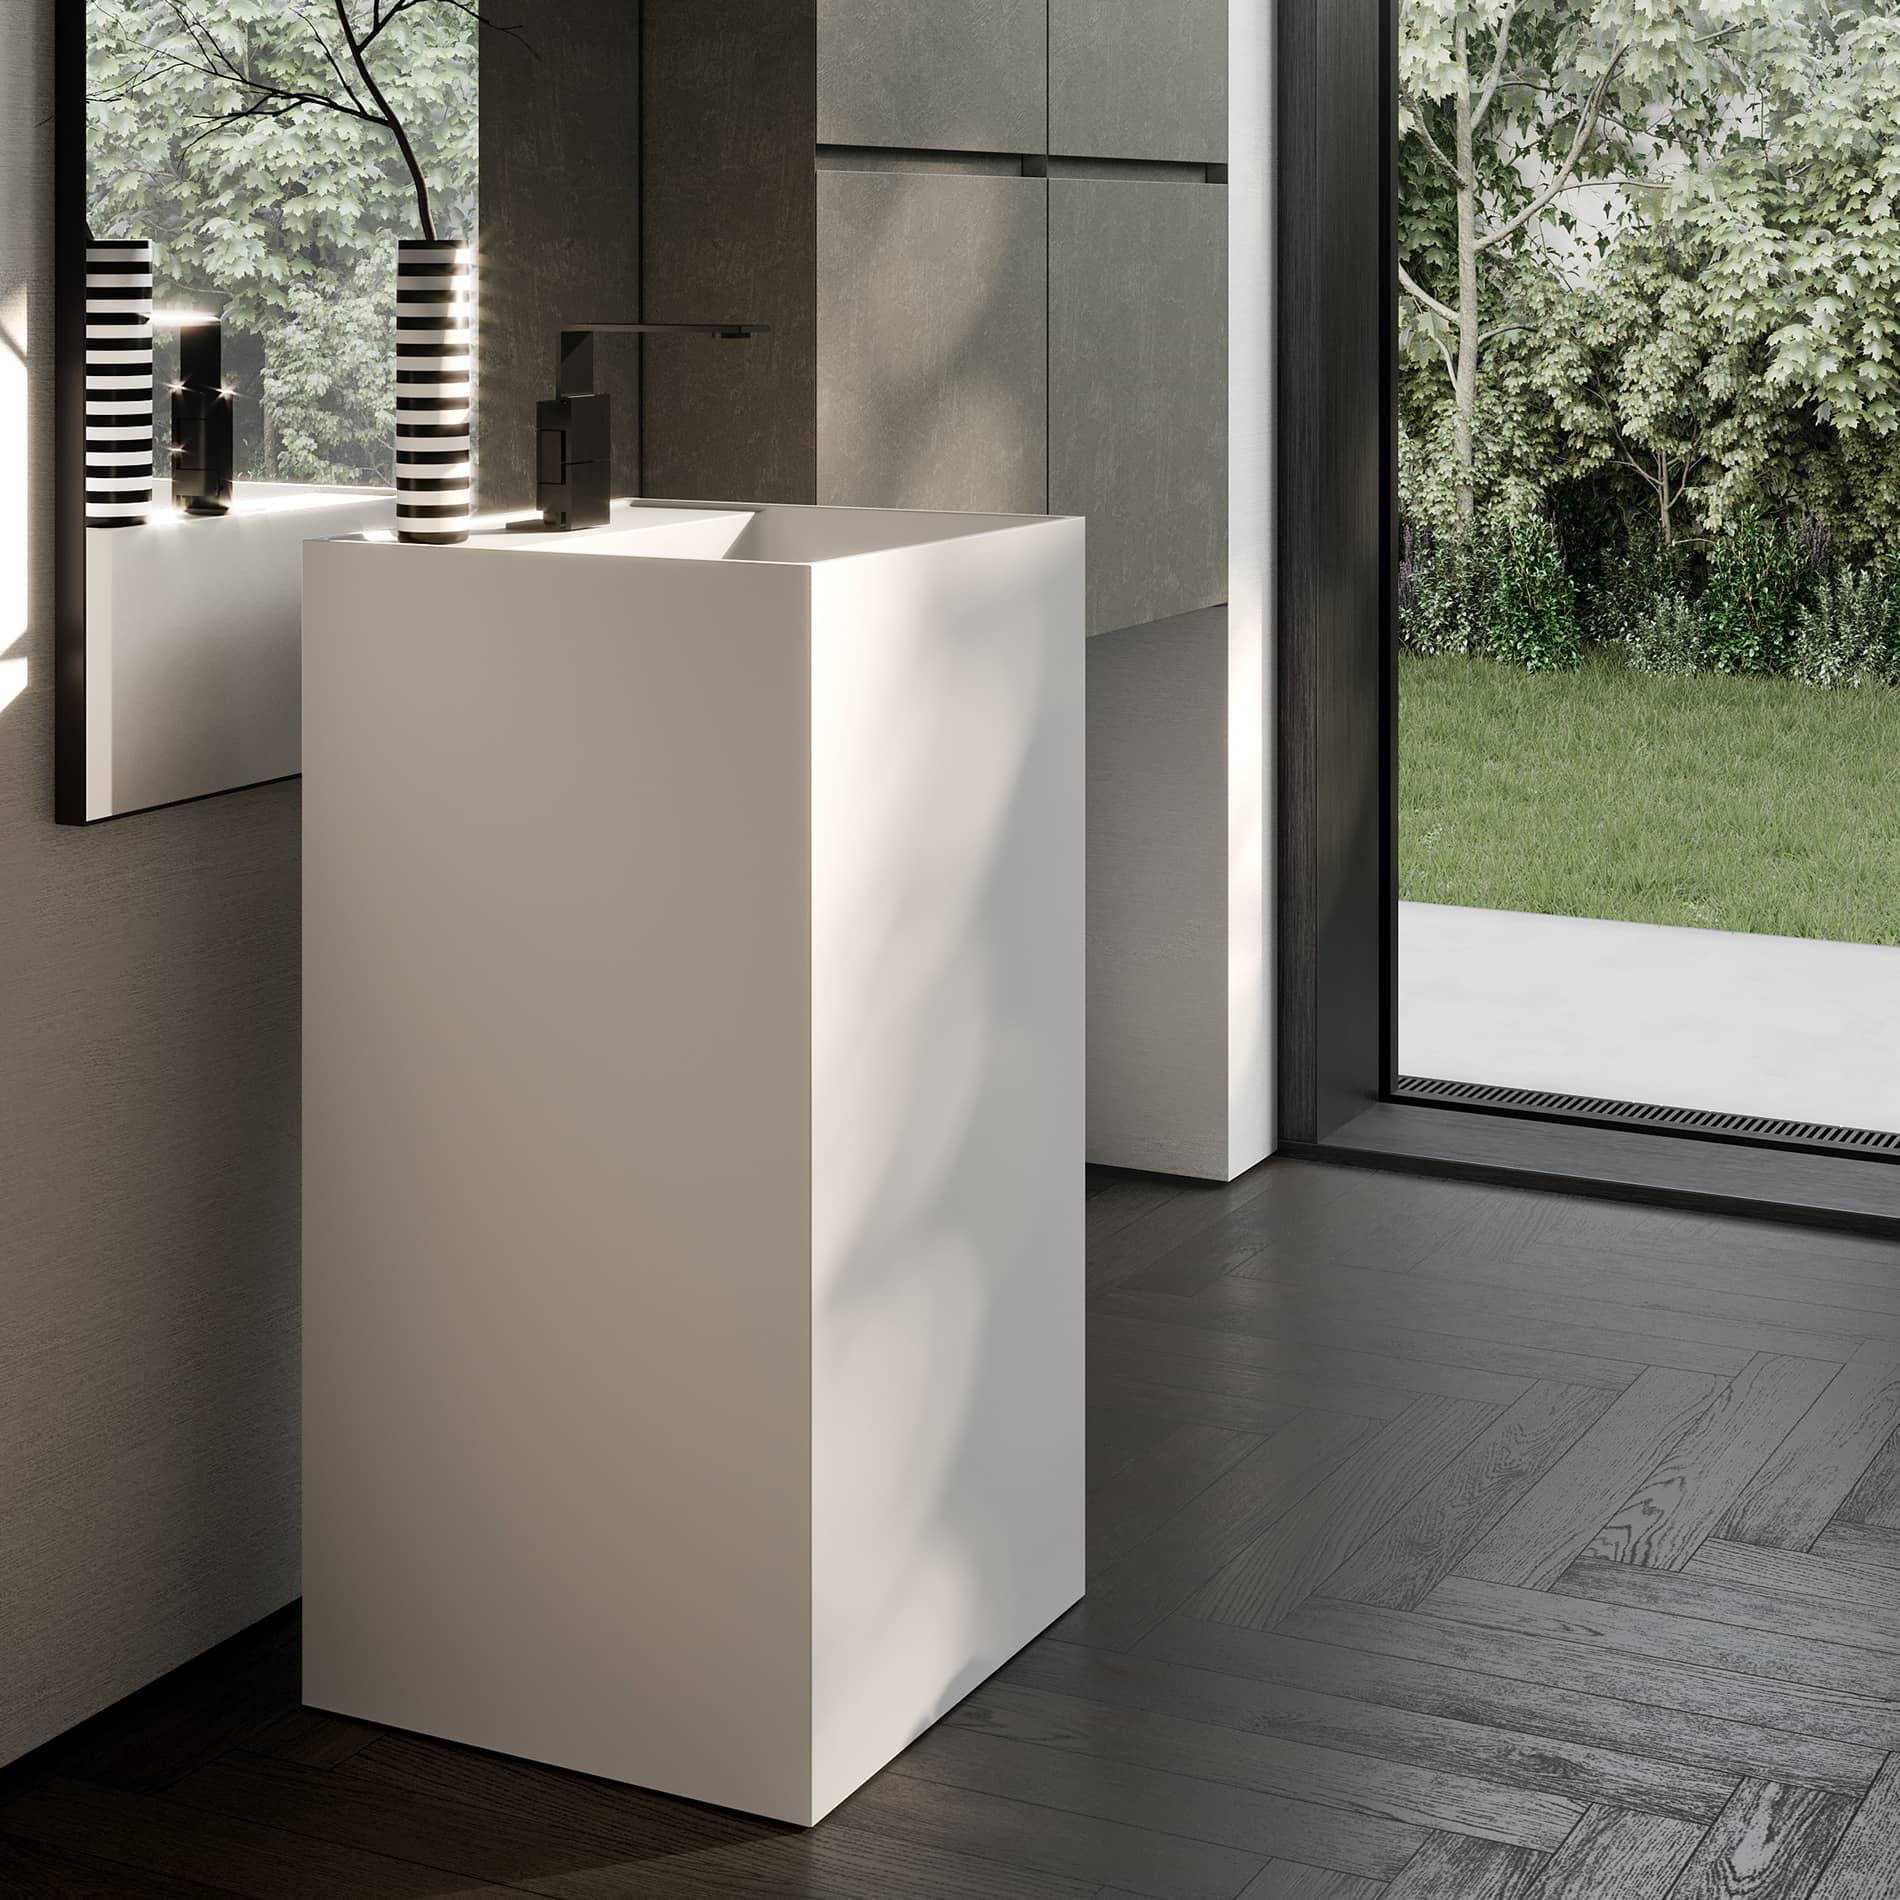 Cristalplant-products-Idea-Group-washbasins-1